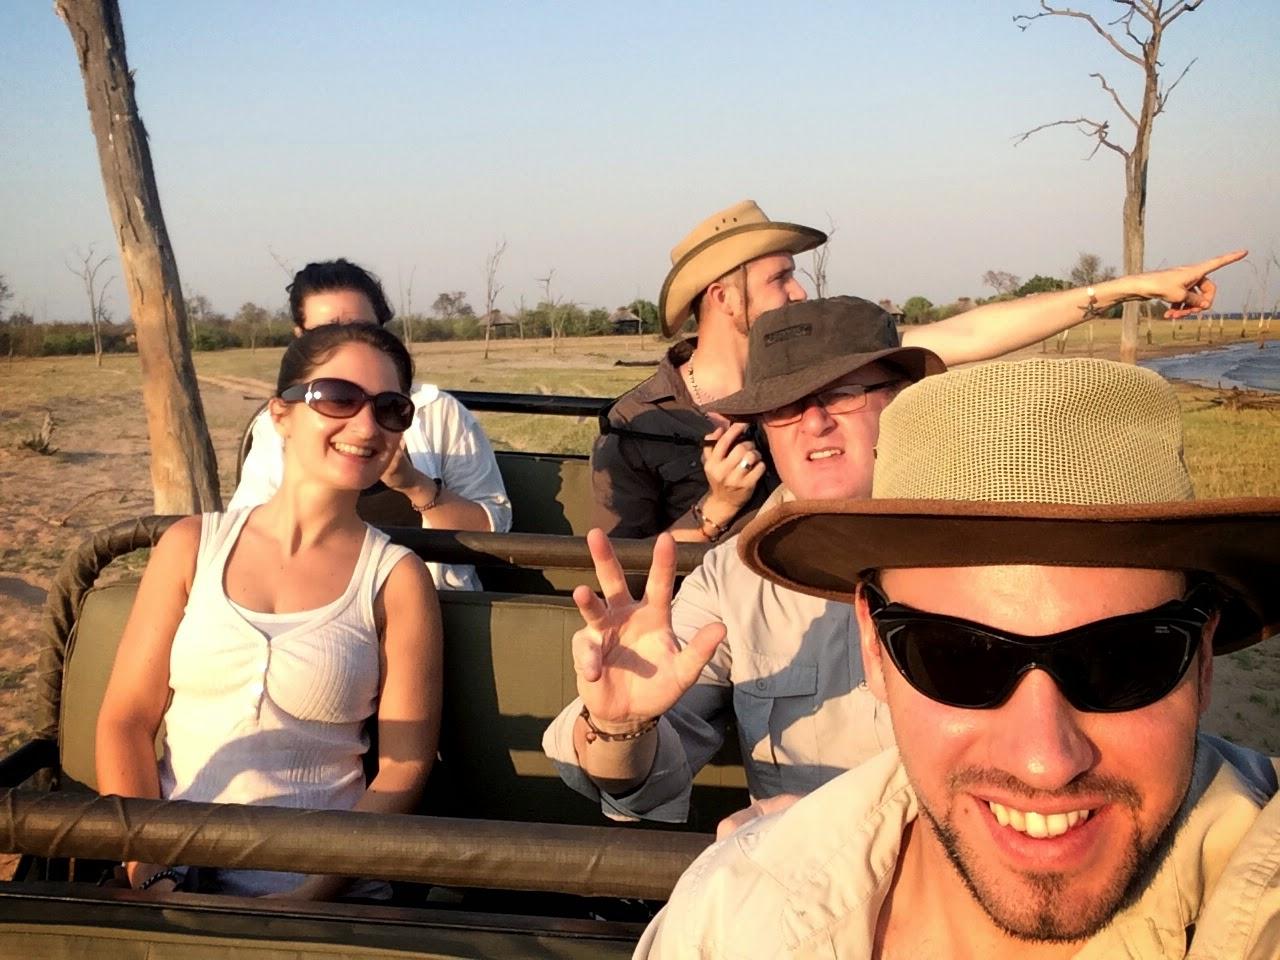 Game drive selfie - Rhino Safari Camp concession